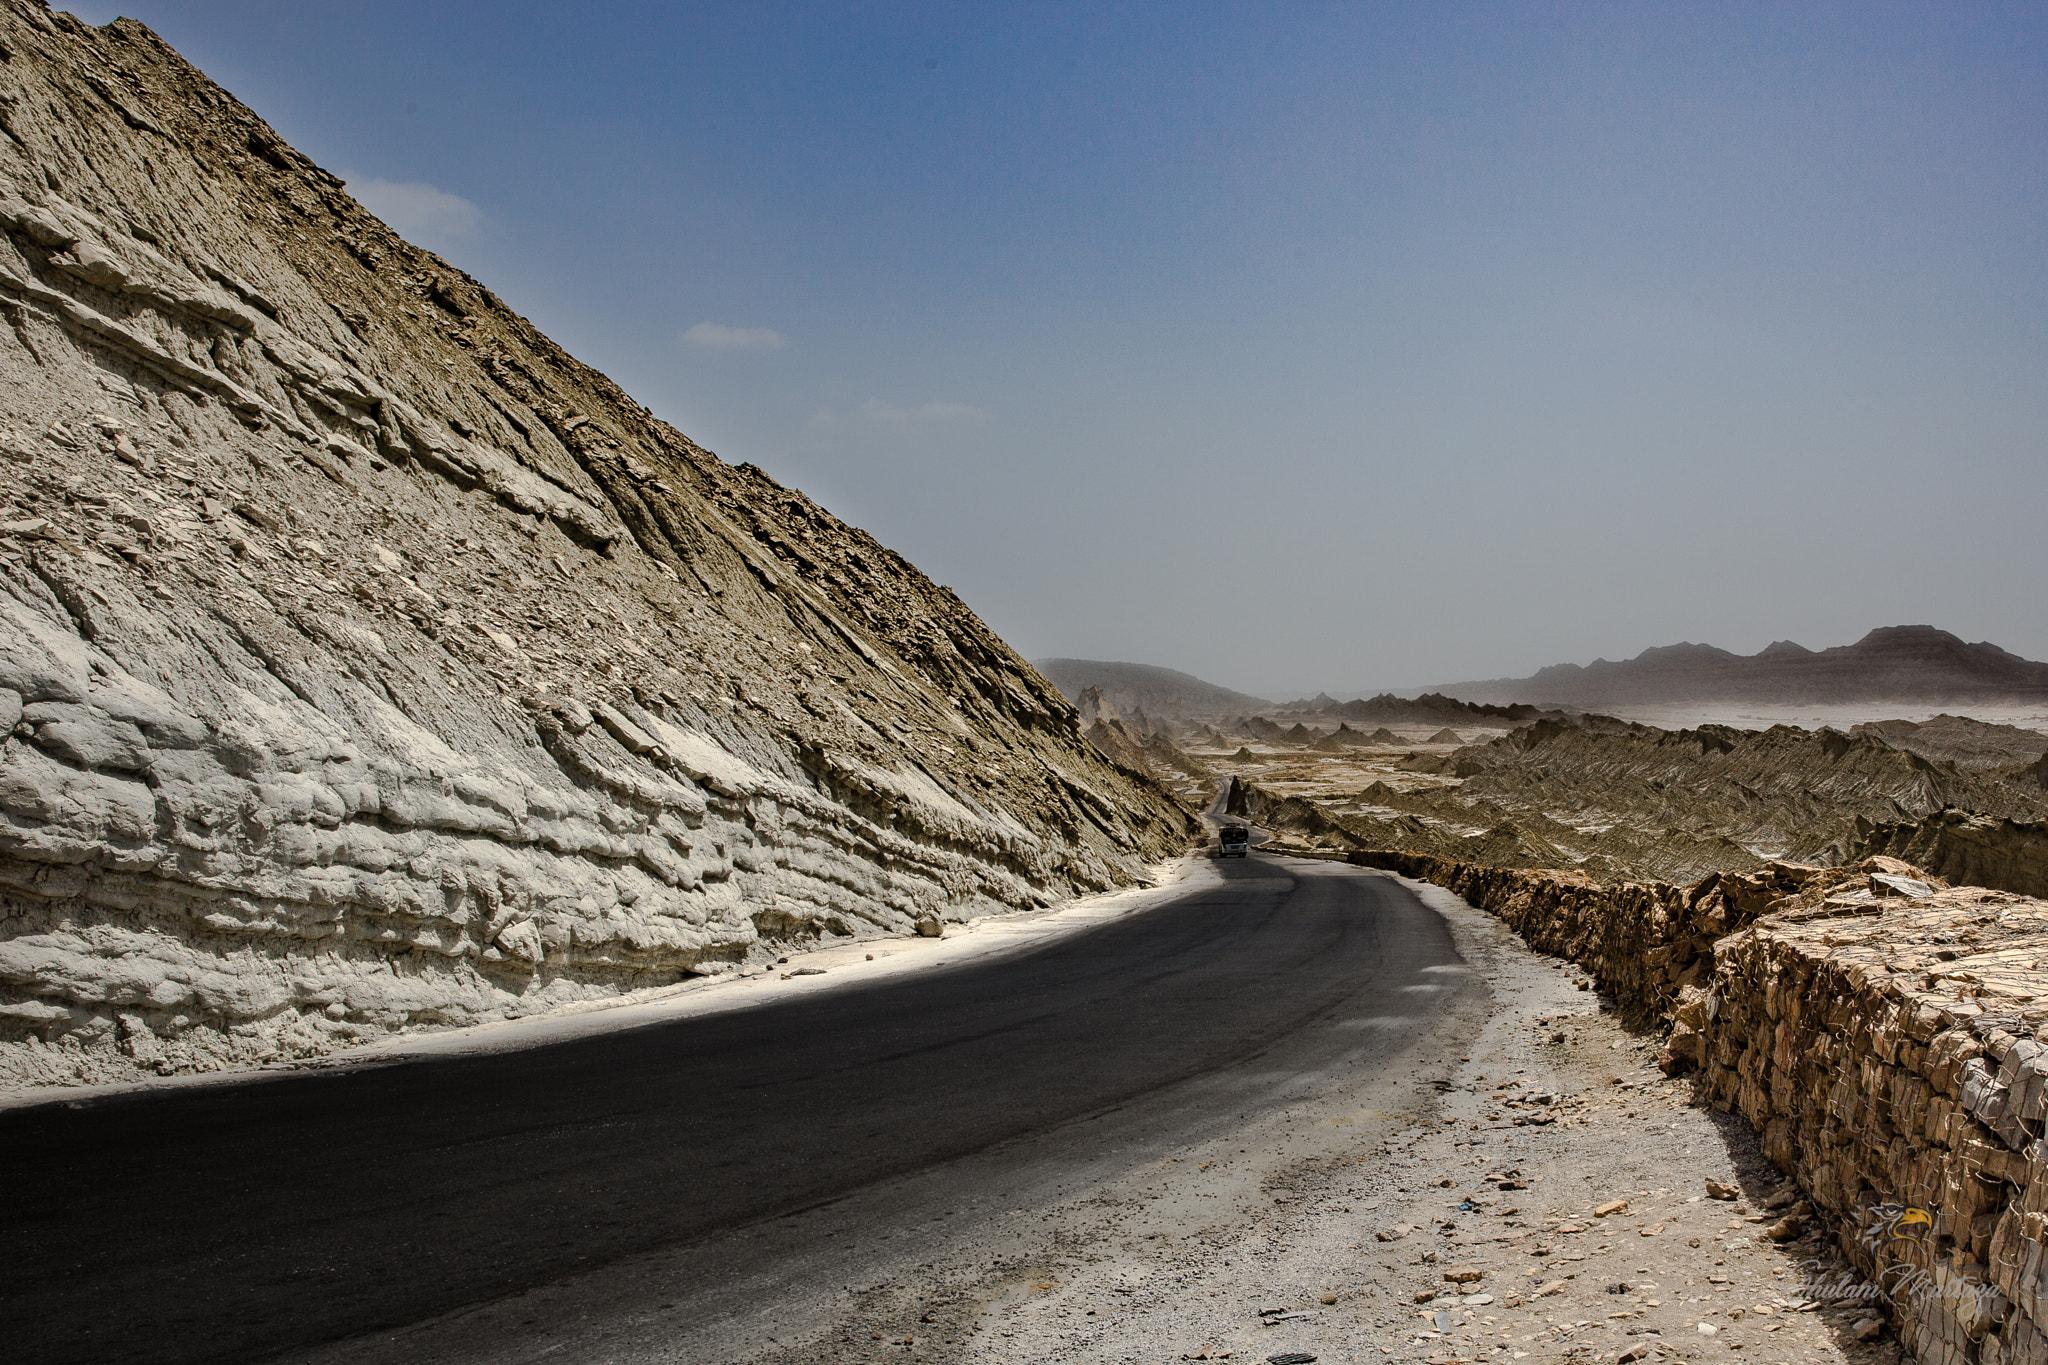 Makran coastal highway